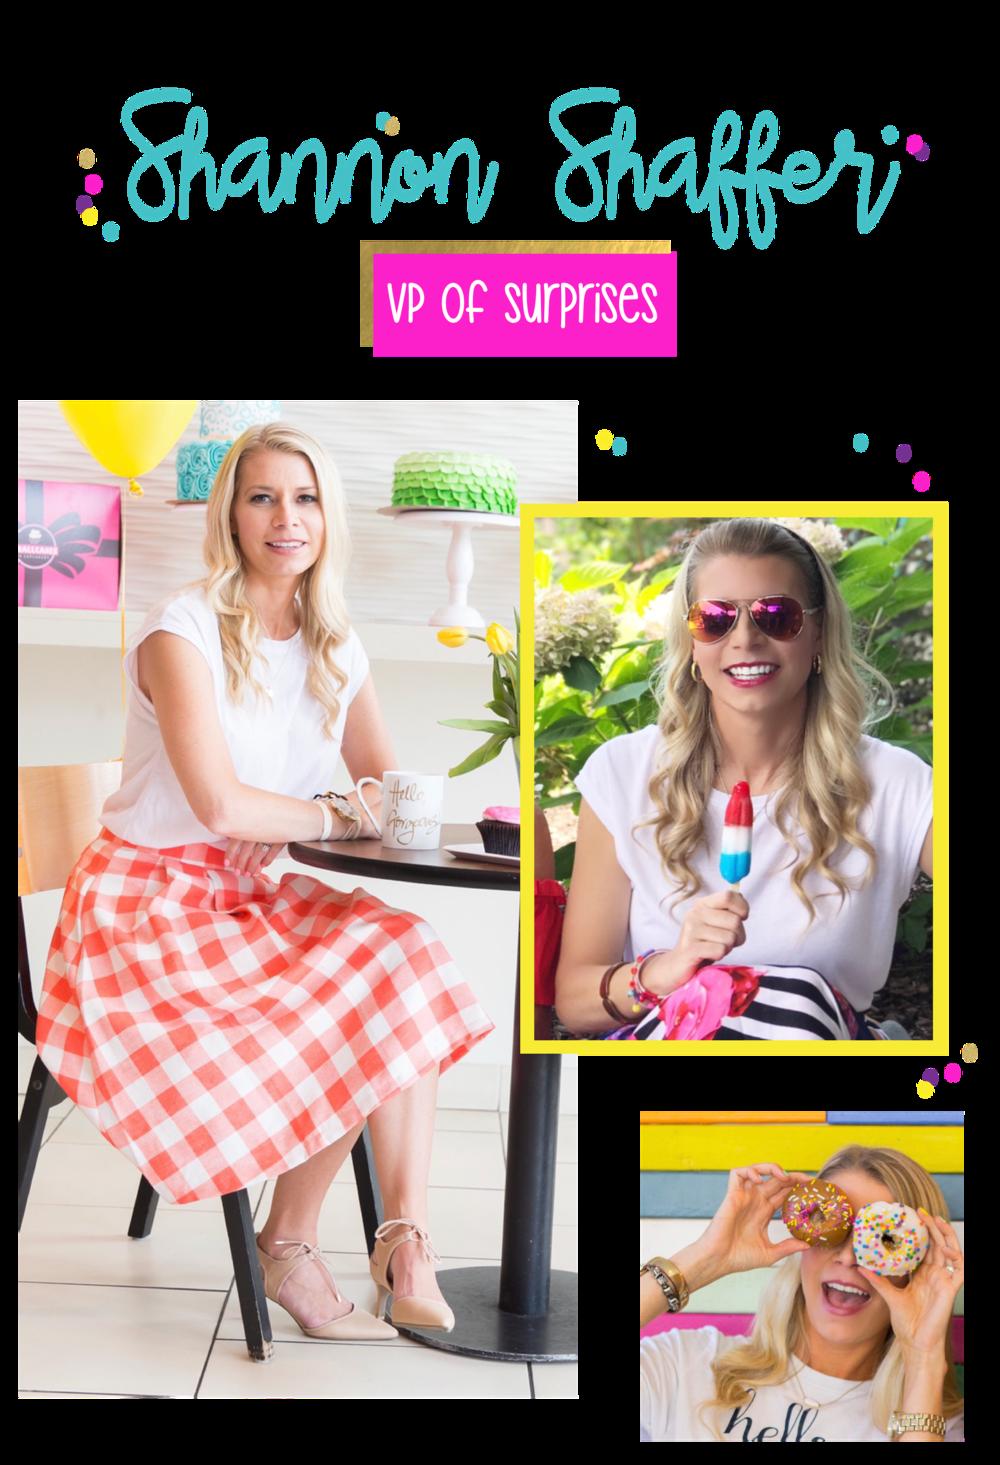 Surprise Gift Co. : Meet Shannon Shaffer, VP of Surprises